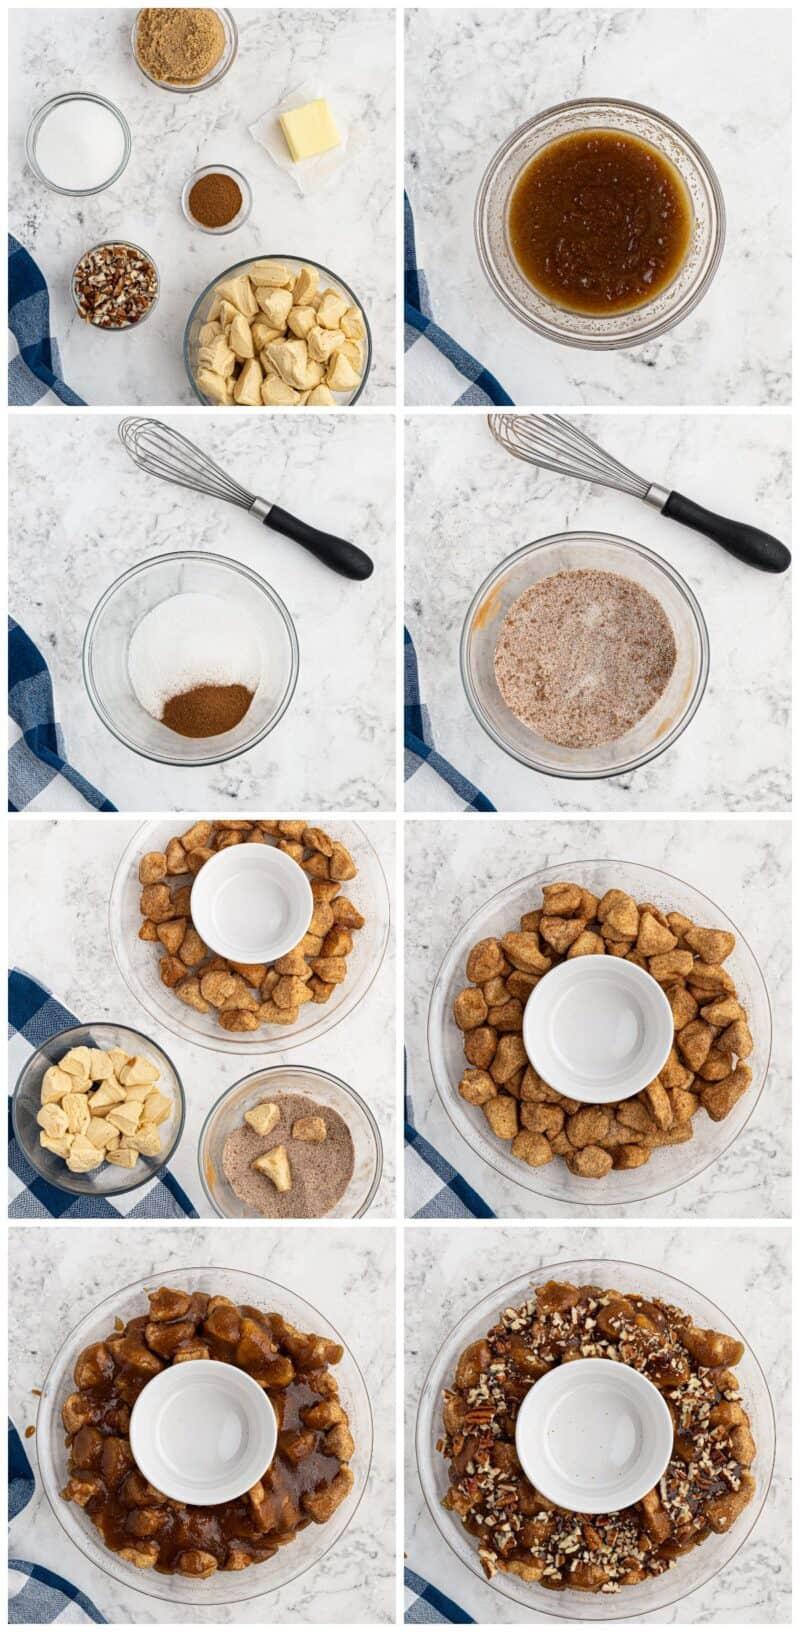 microwave monkey bread step by step recipe photos